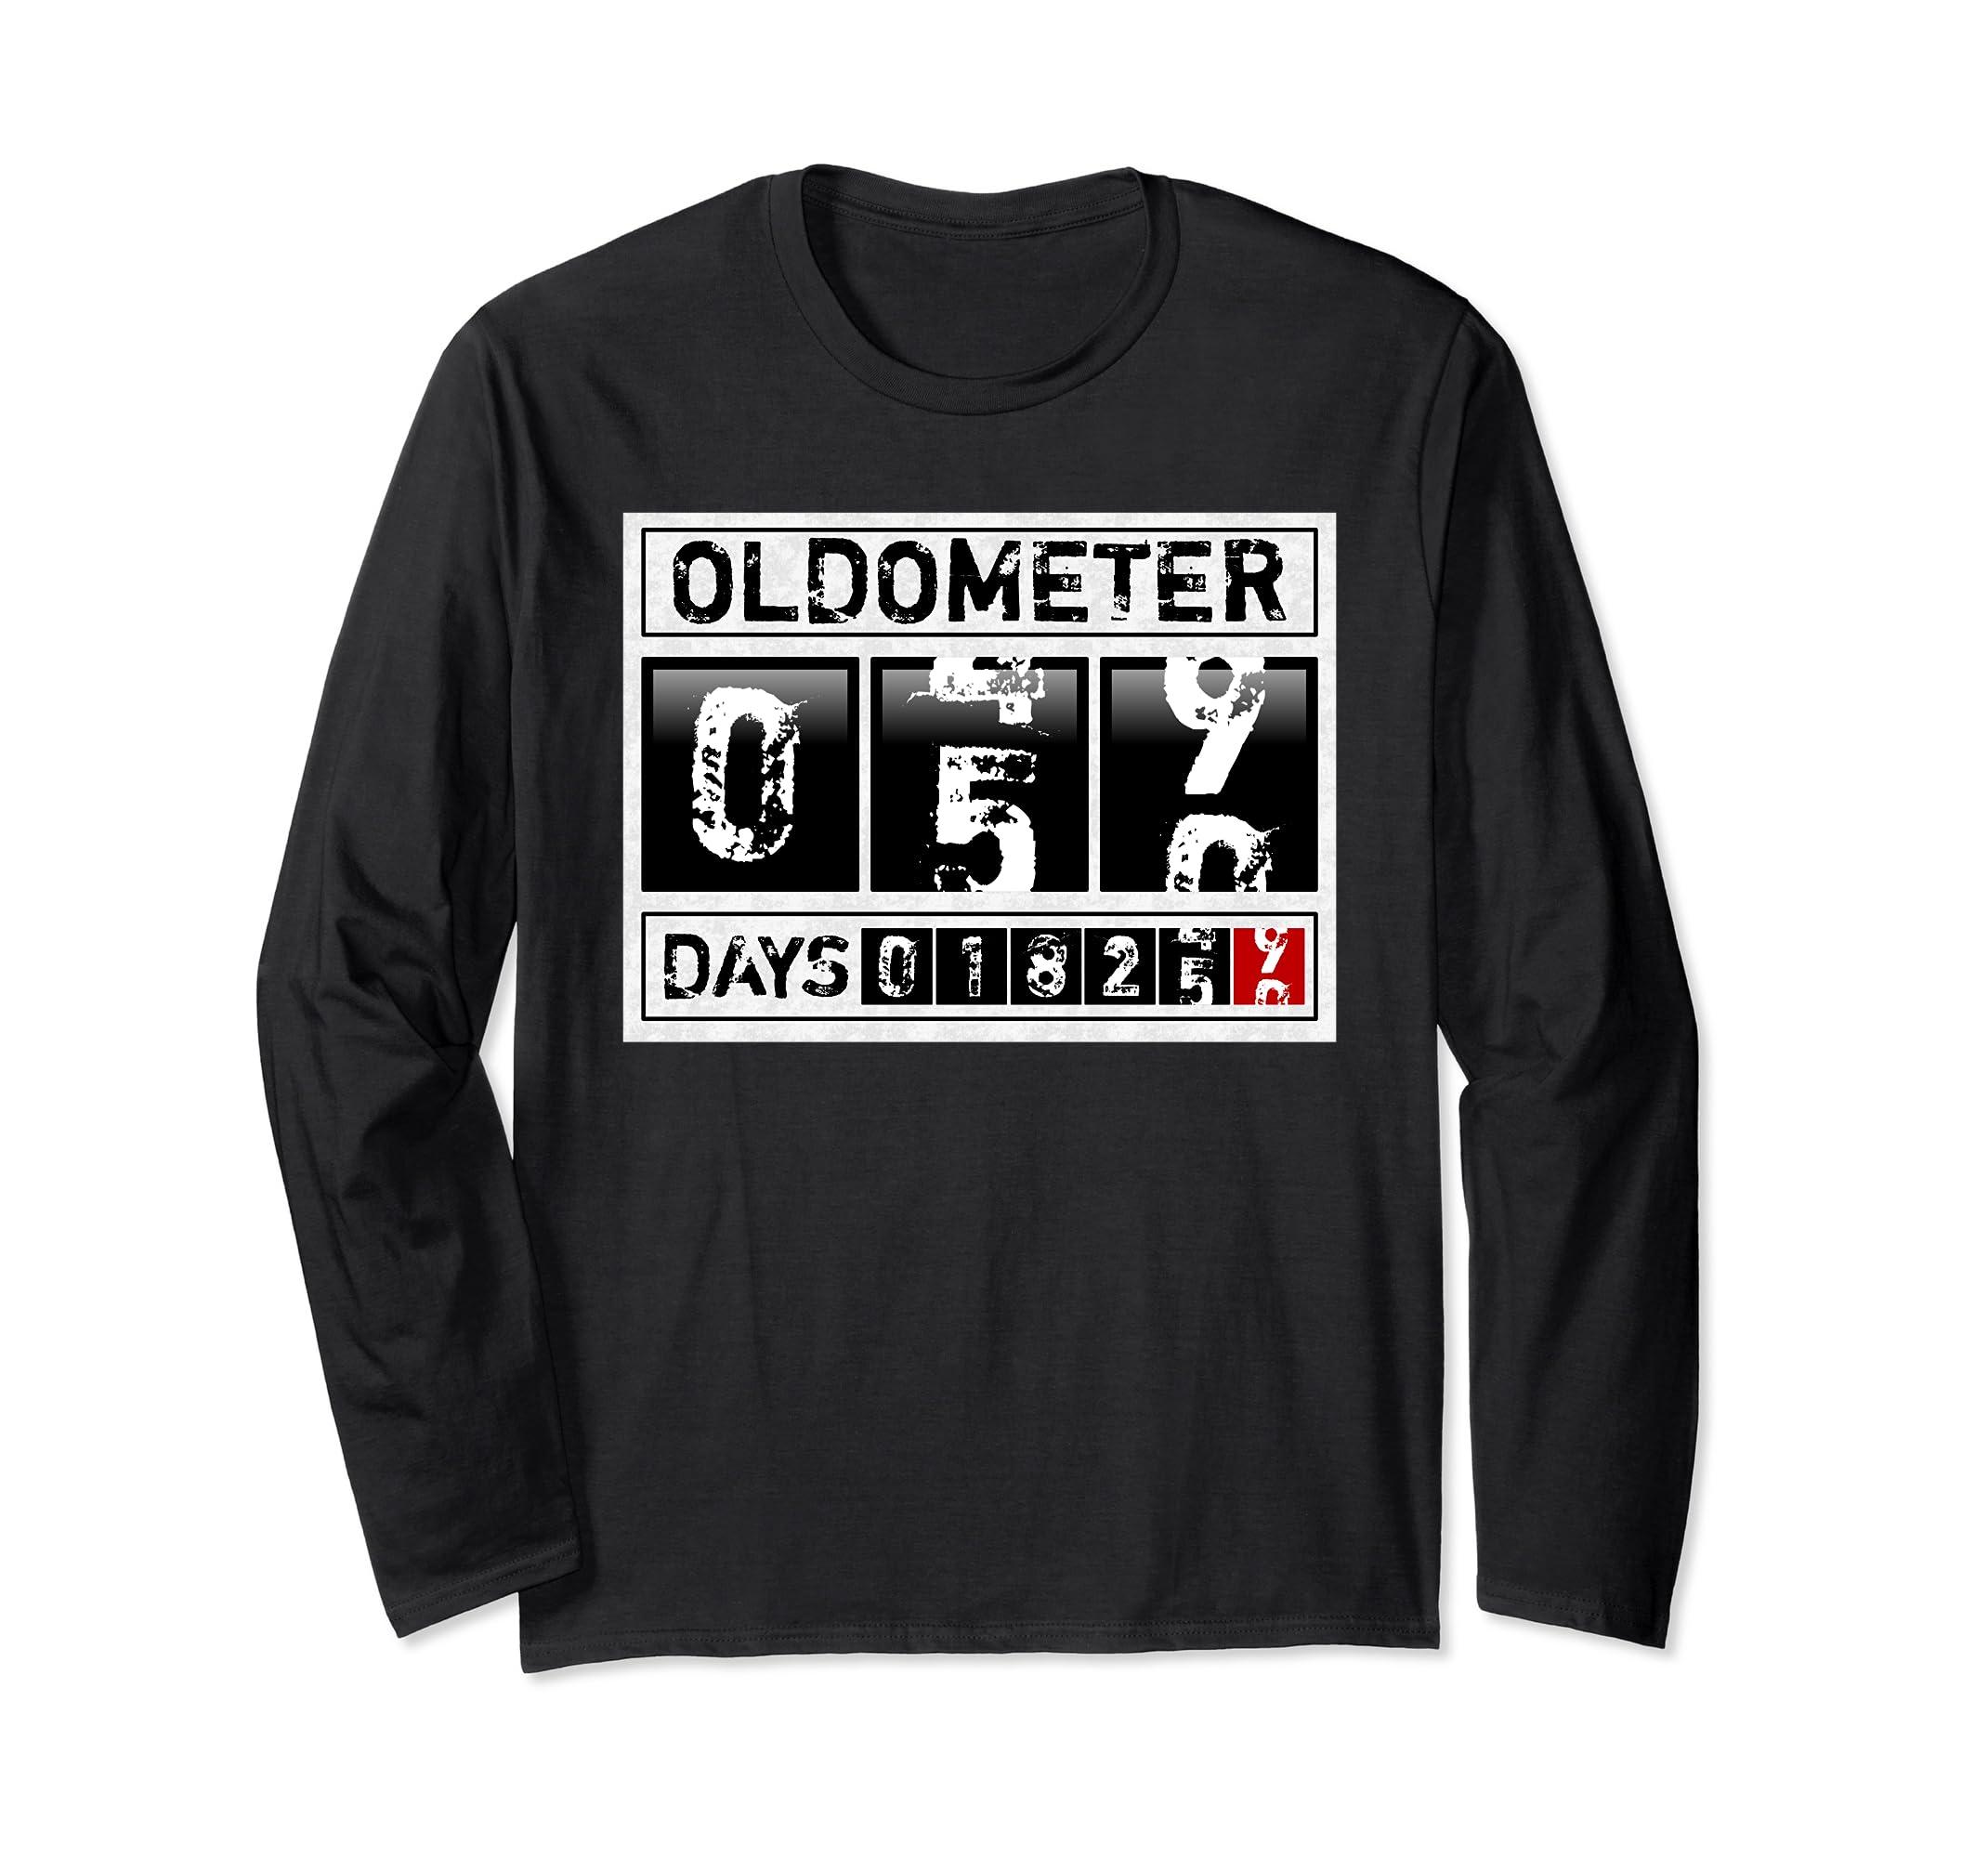 eb5fe055 Amazon.com: Funny 50th Birthday Long Sleeve T-Shirt 50 Years Oldometer:  Clothing